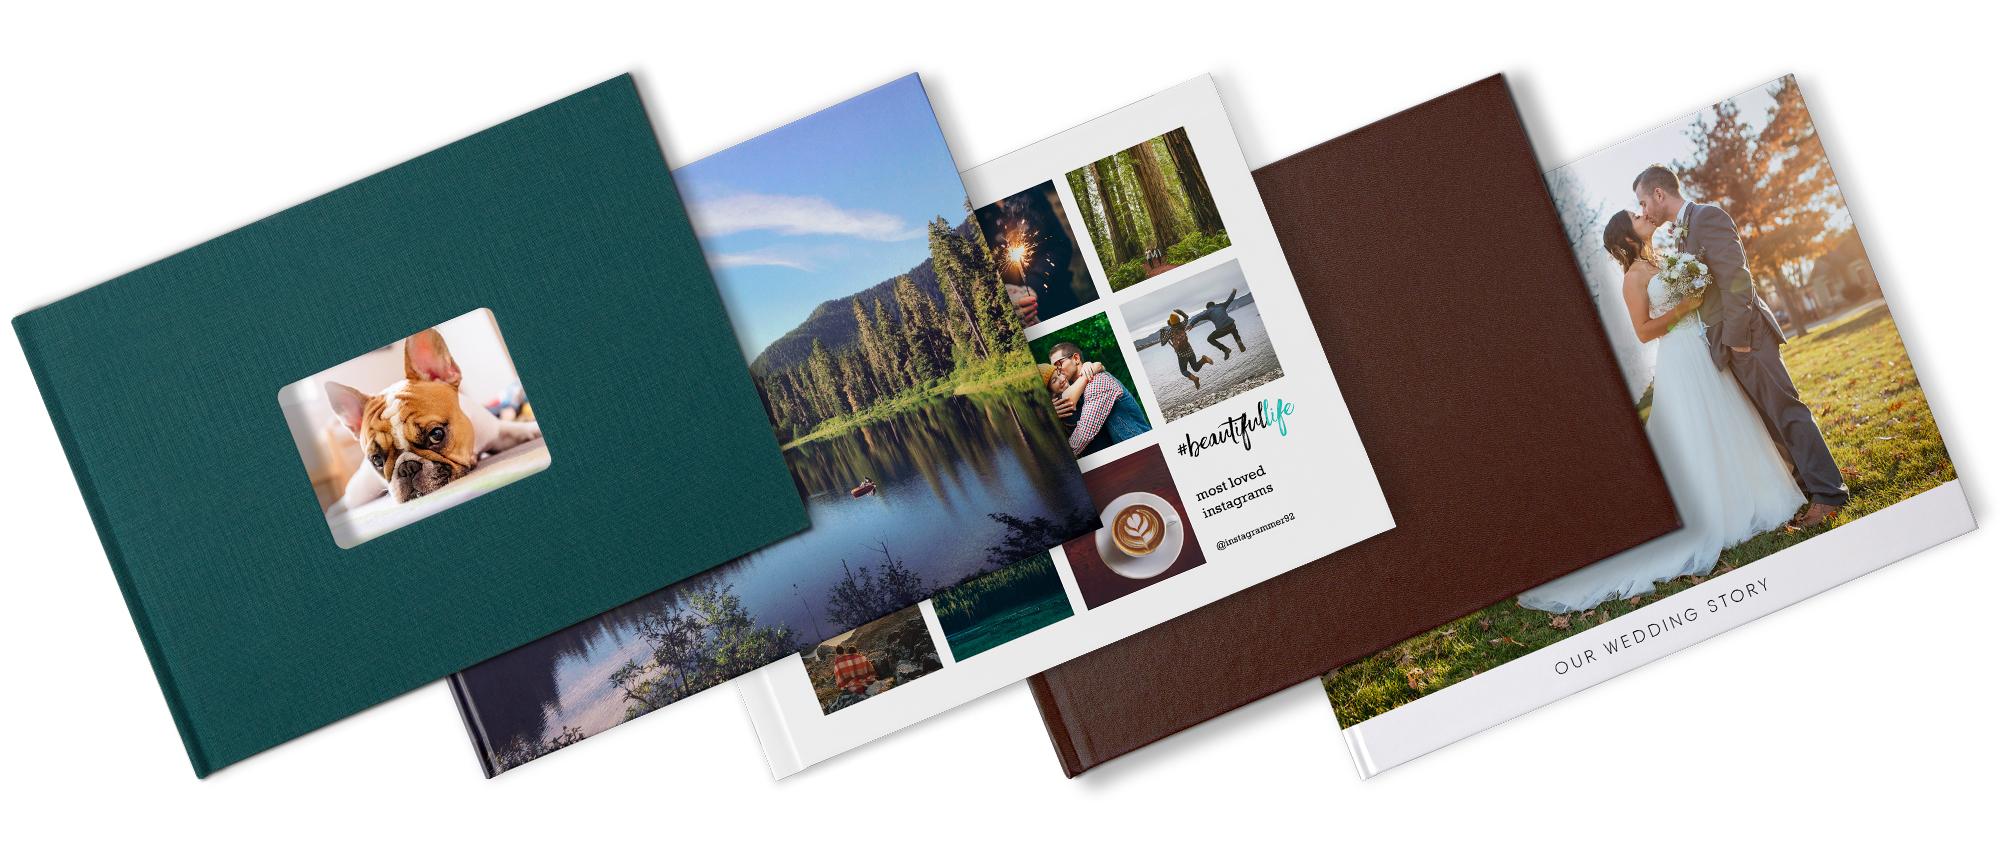 Photo Books | Make a Book | Custom Photo Books | Snapfish